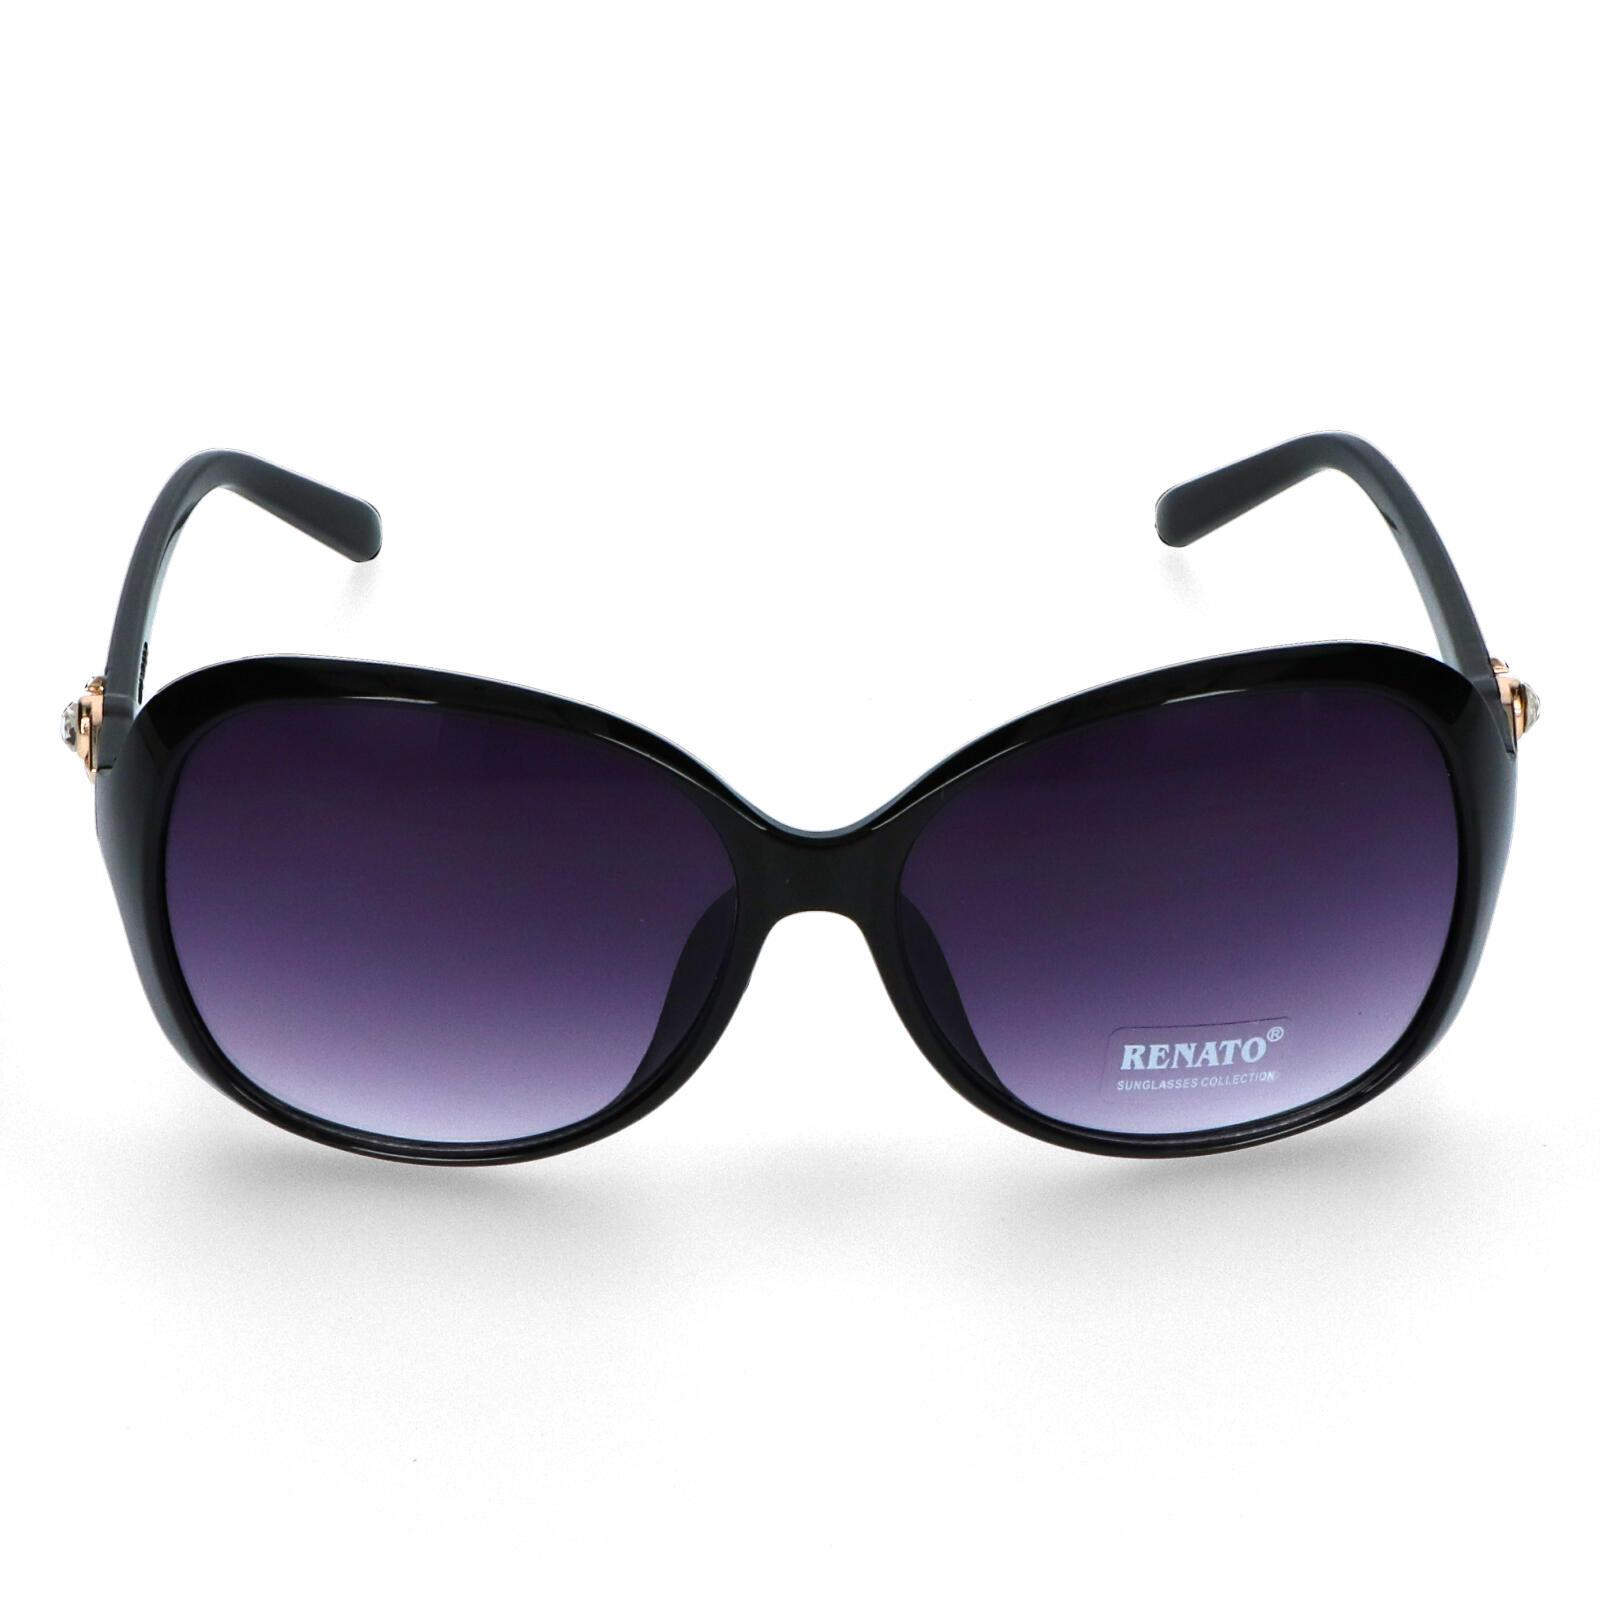 Dámske slnečné okuliare čierne - I213